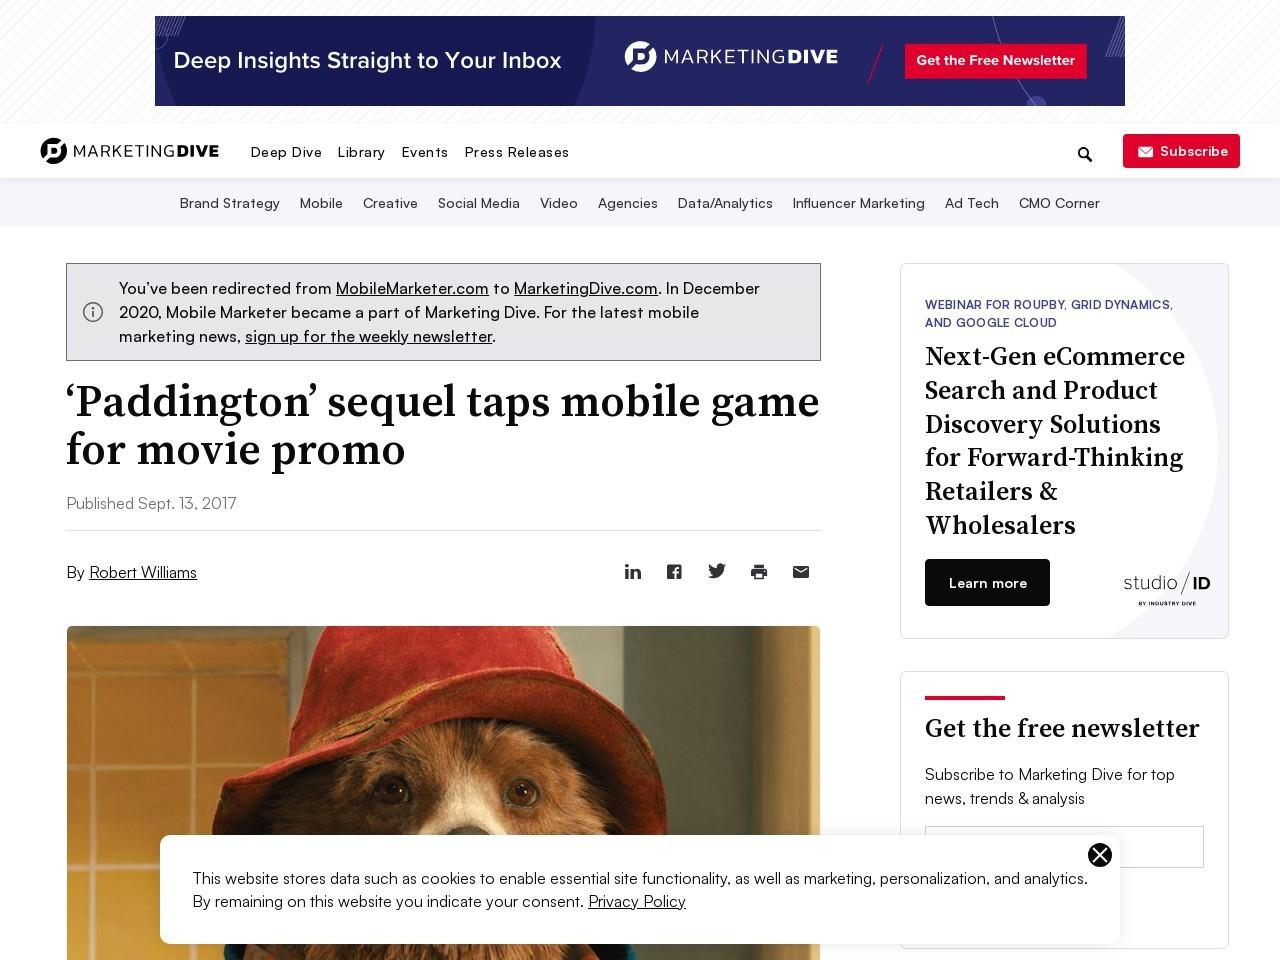 'Paddington' sequel taps mobile game for movie promo